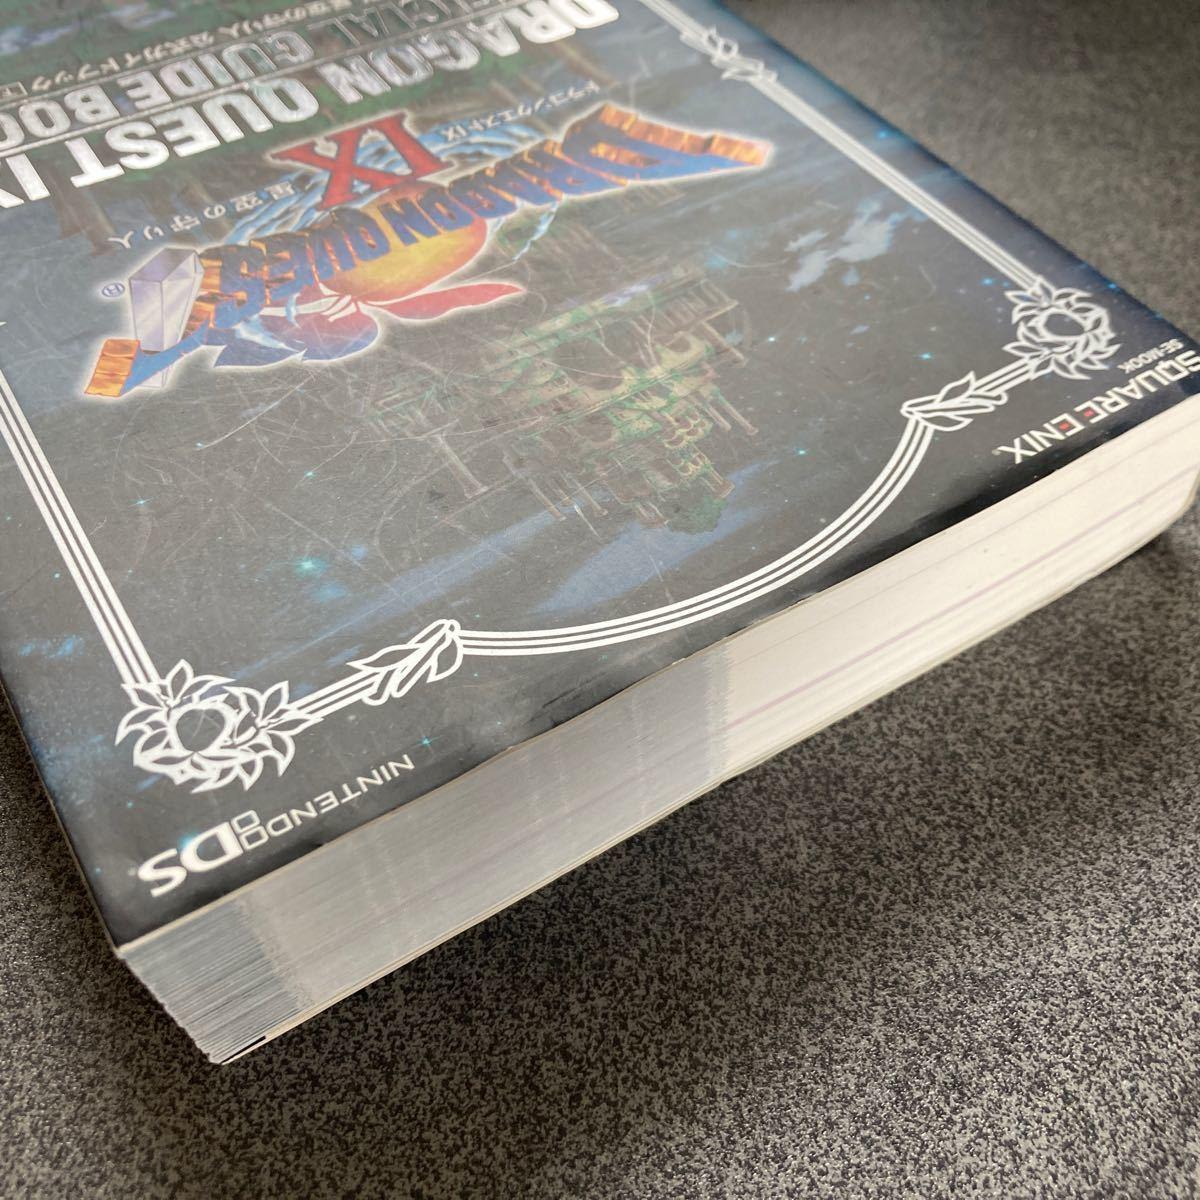 【DS】 ドラゴンクエストIX 星空の守り人と攻略本のセット